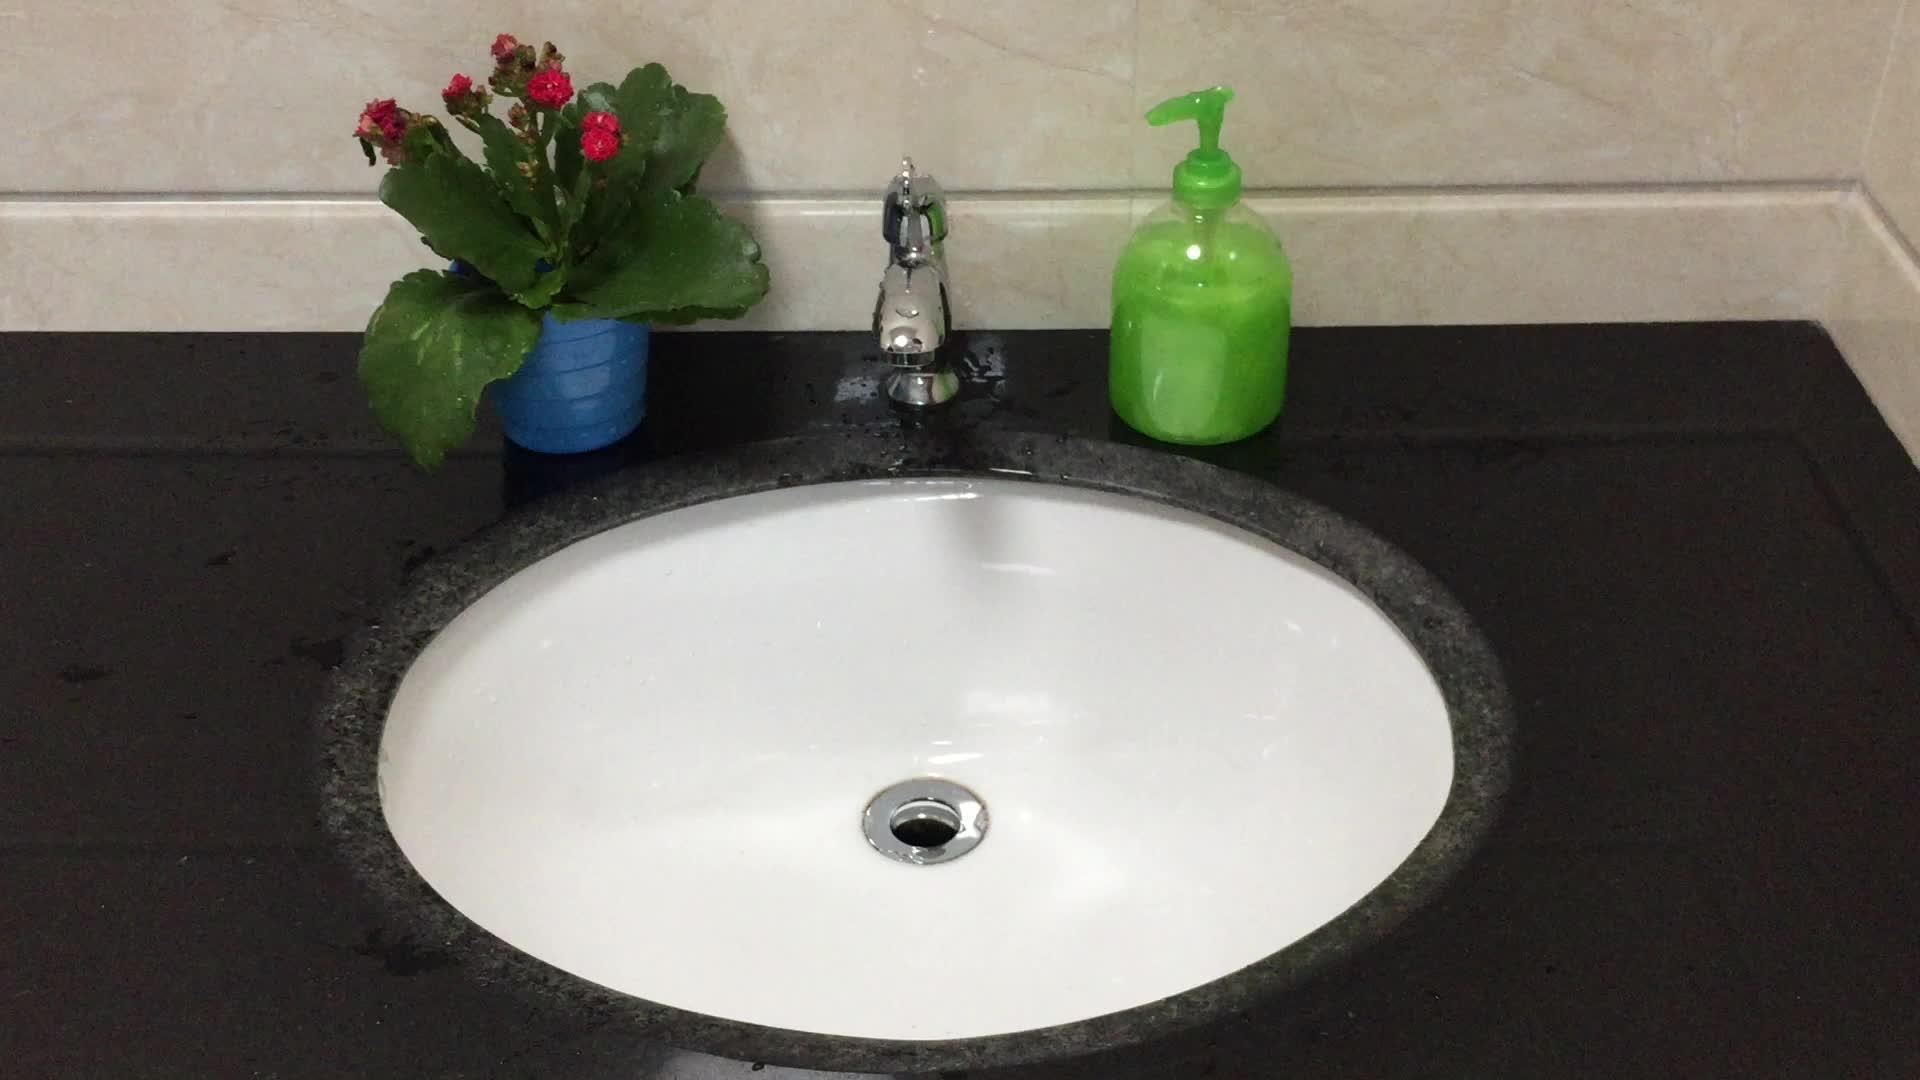 Grosir plastik lotion pompa botol untuk shampoo, sabun cair